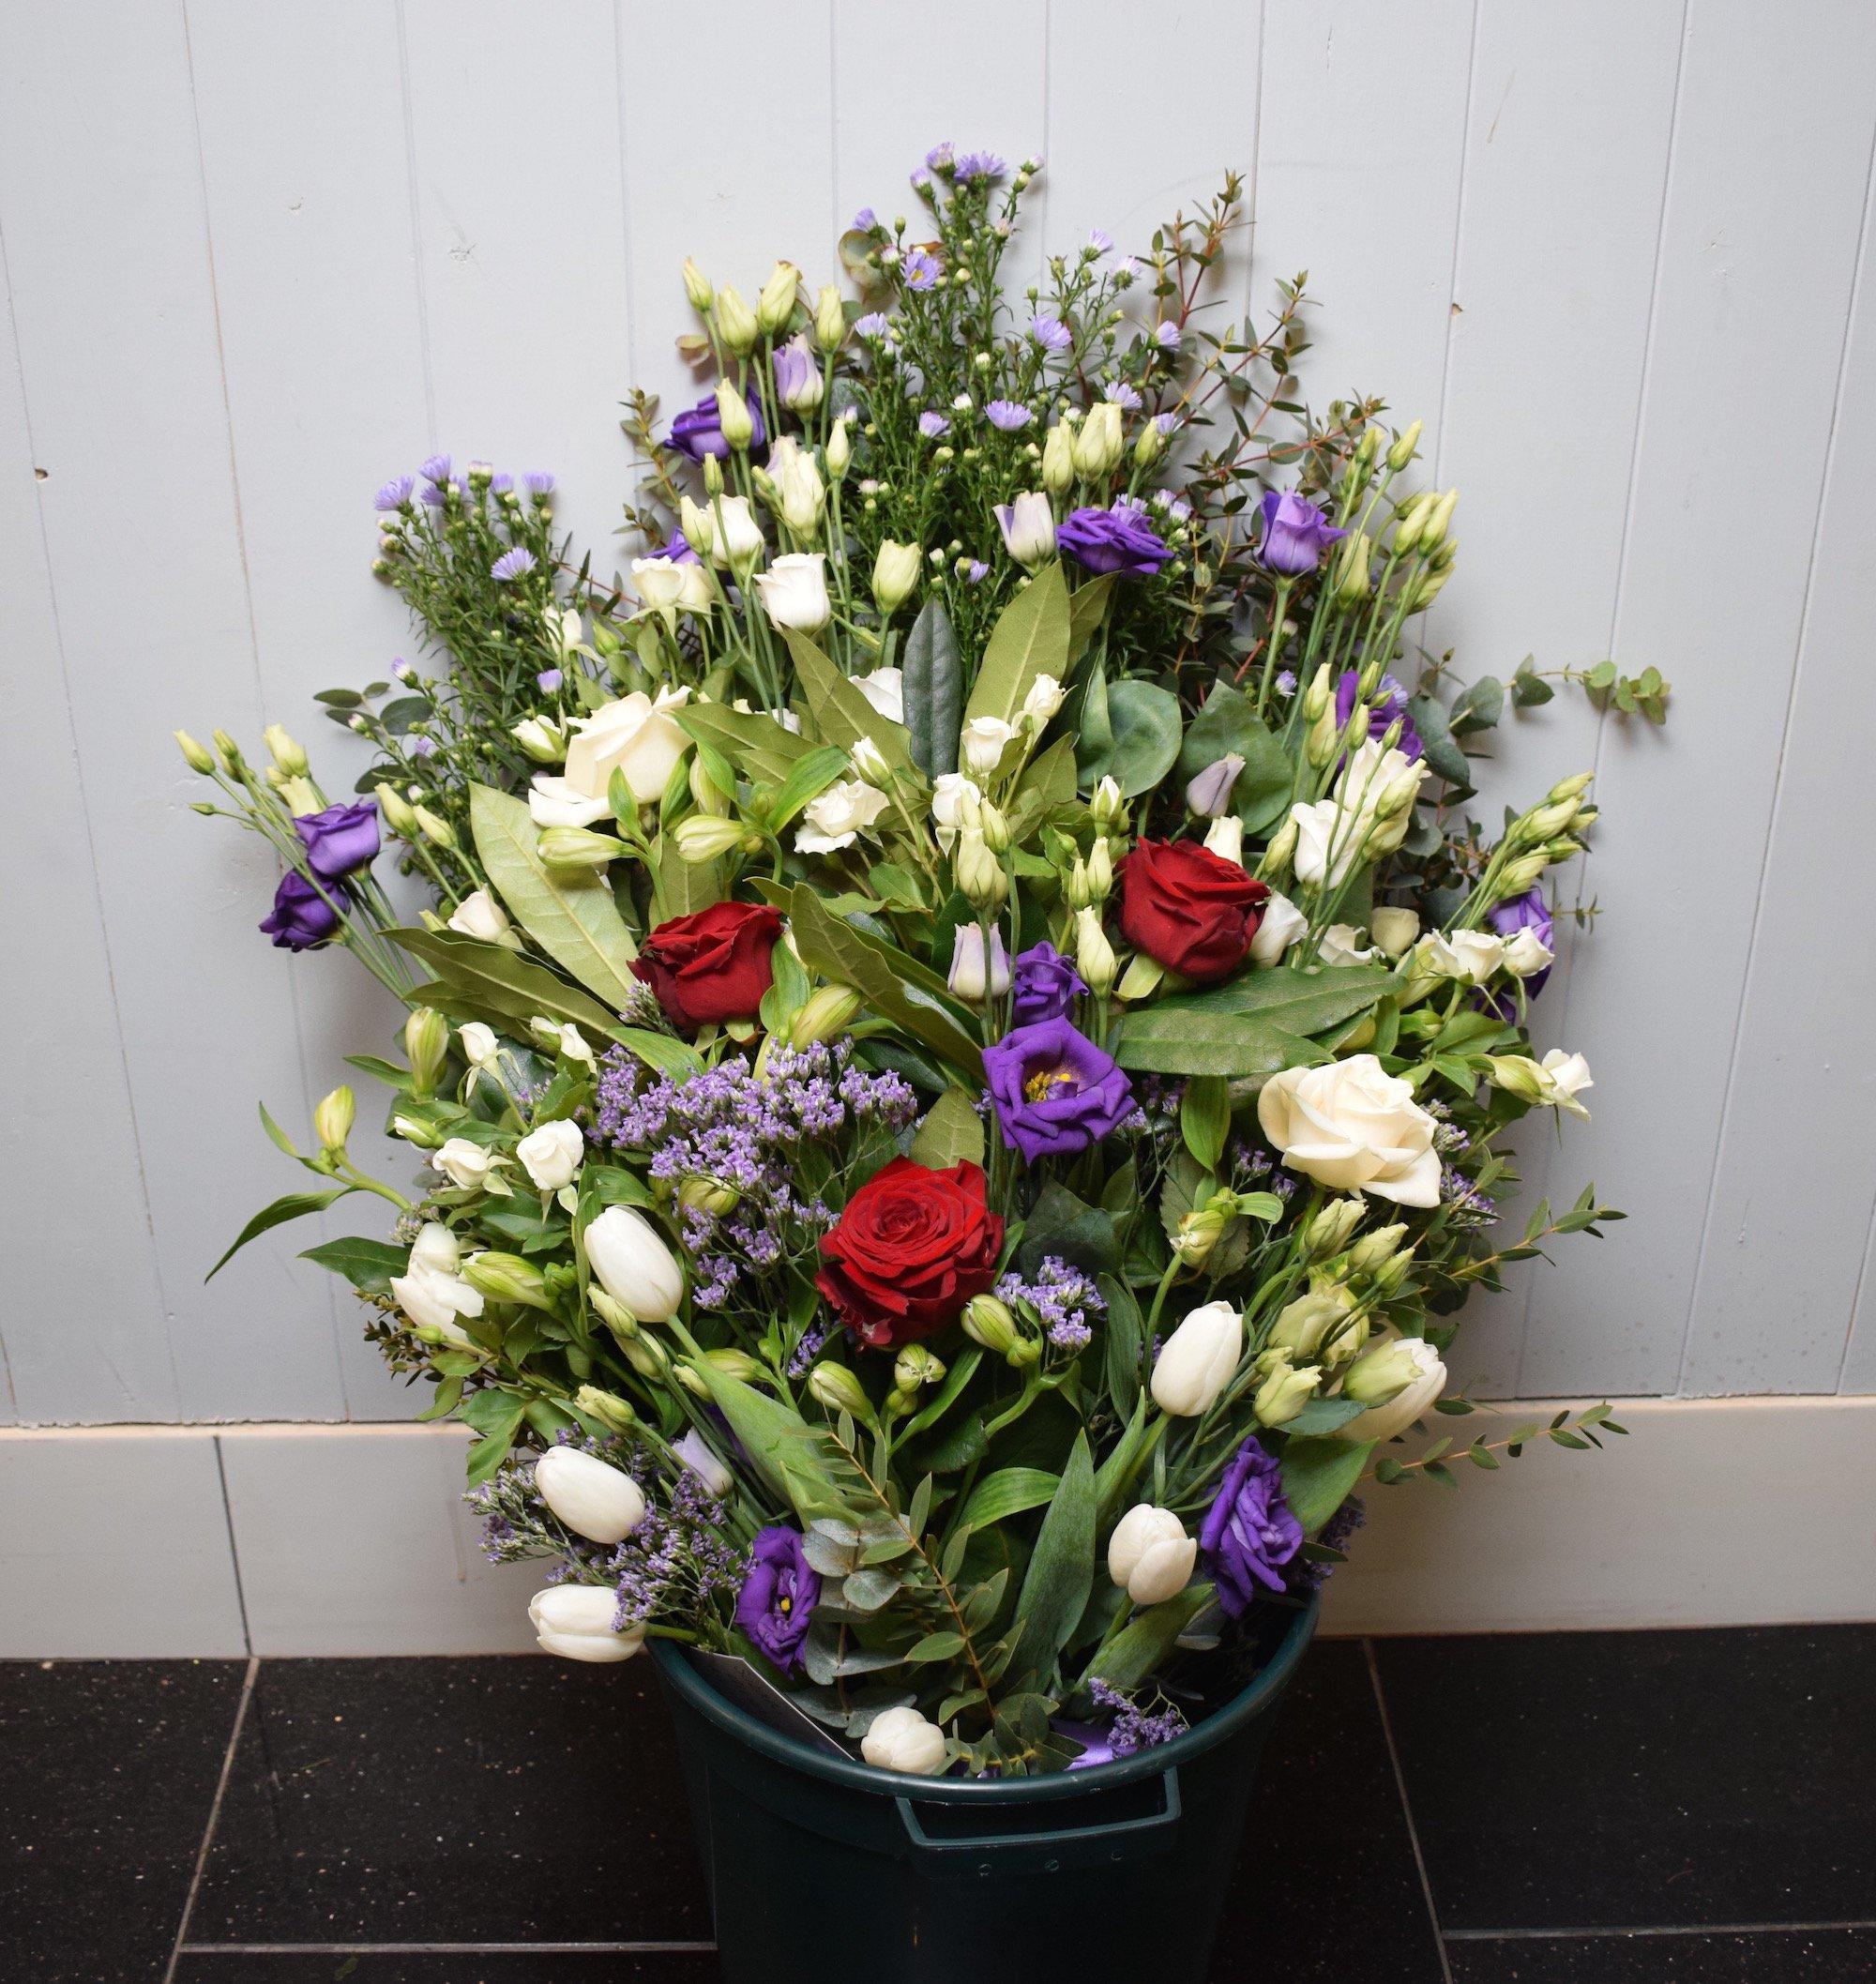 Florist delivery brighton same day flower delivery by httpsflowers brighton hoveuploadsclasicgrnwhiteposyg izmirmasajfo